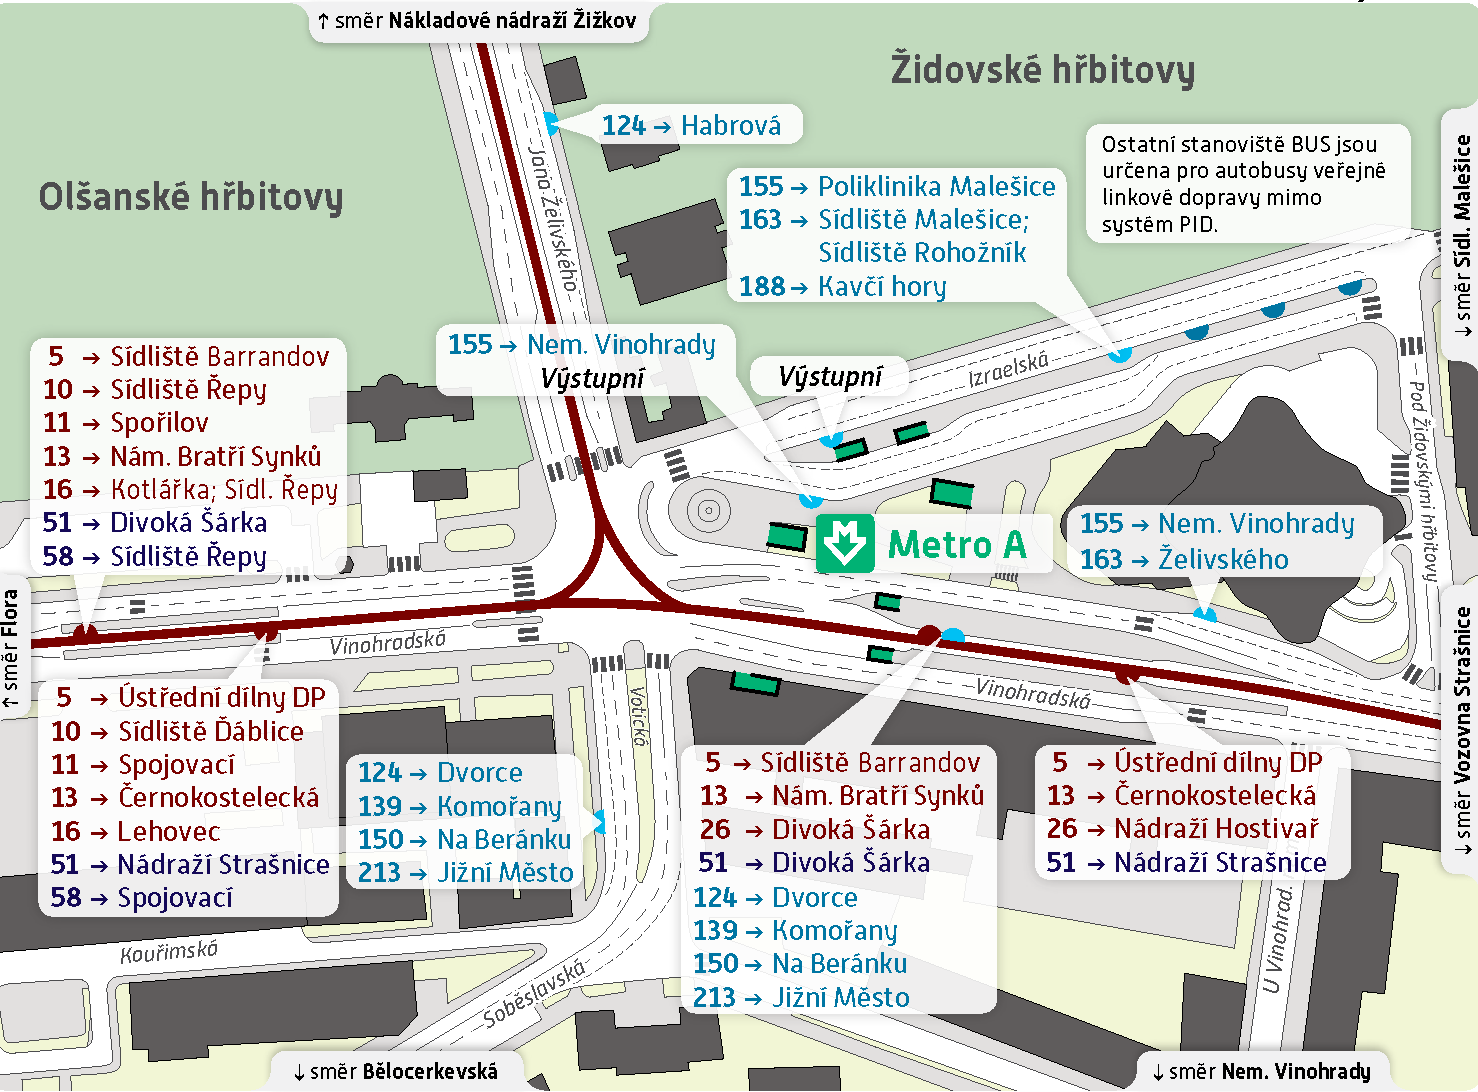 Станция метро Želivského